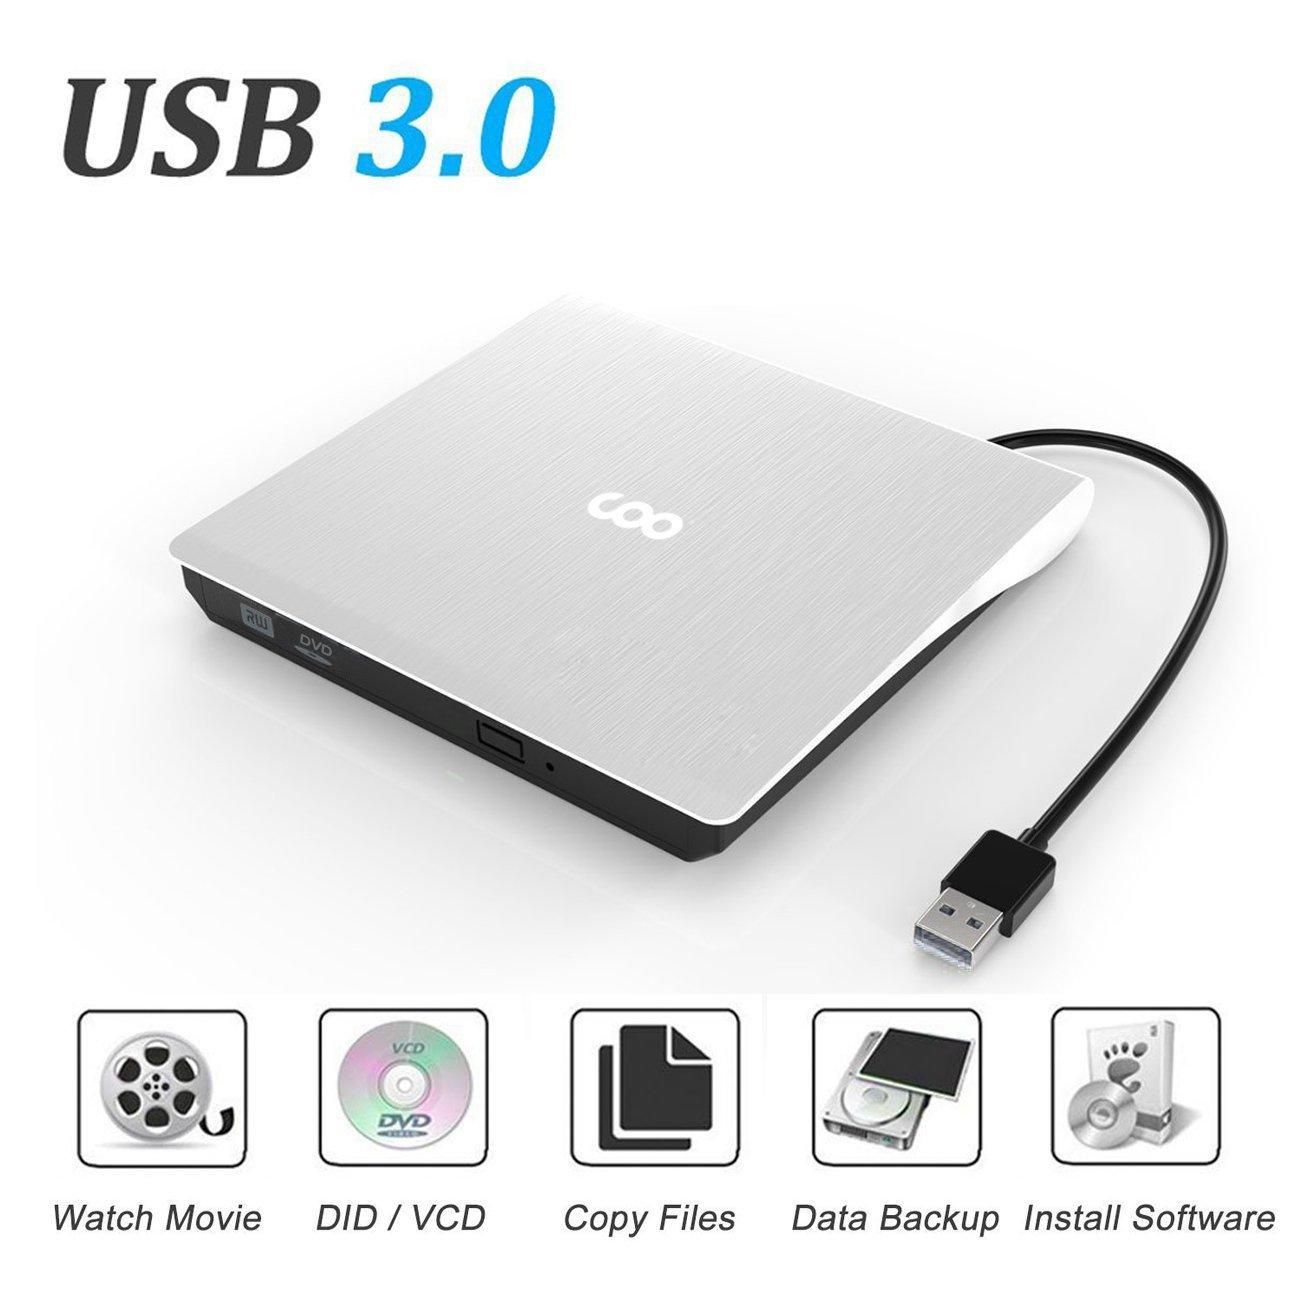 External CD/DVD Drive for Laptop, USB 3.0 Portable Optical Drive DVD+/-RW Writer/Burner CD/DVD Player High Speed Data Transmission Compatible Laptop Desktops System Windows XP/7/8.1/10/Vista/MacOS